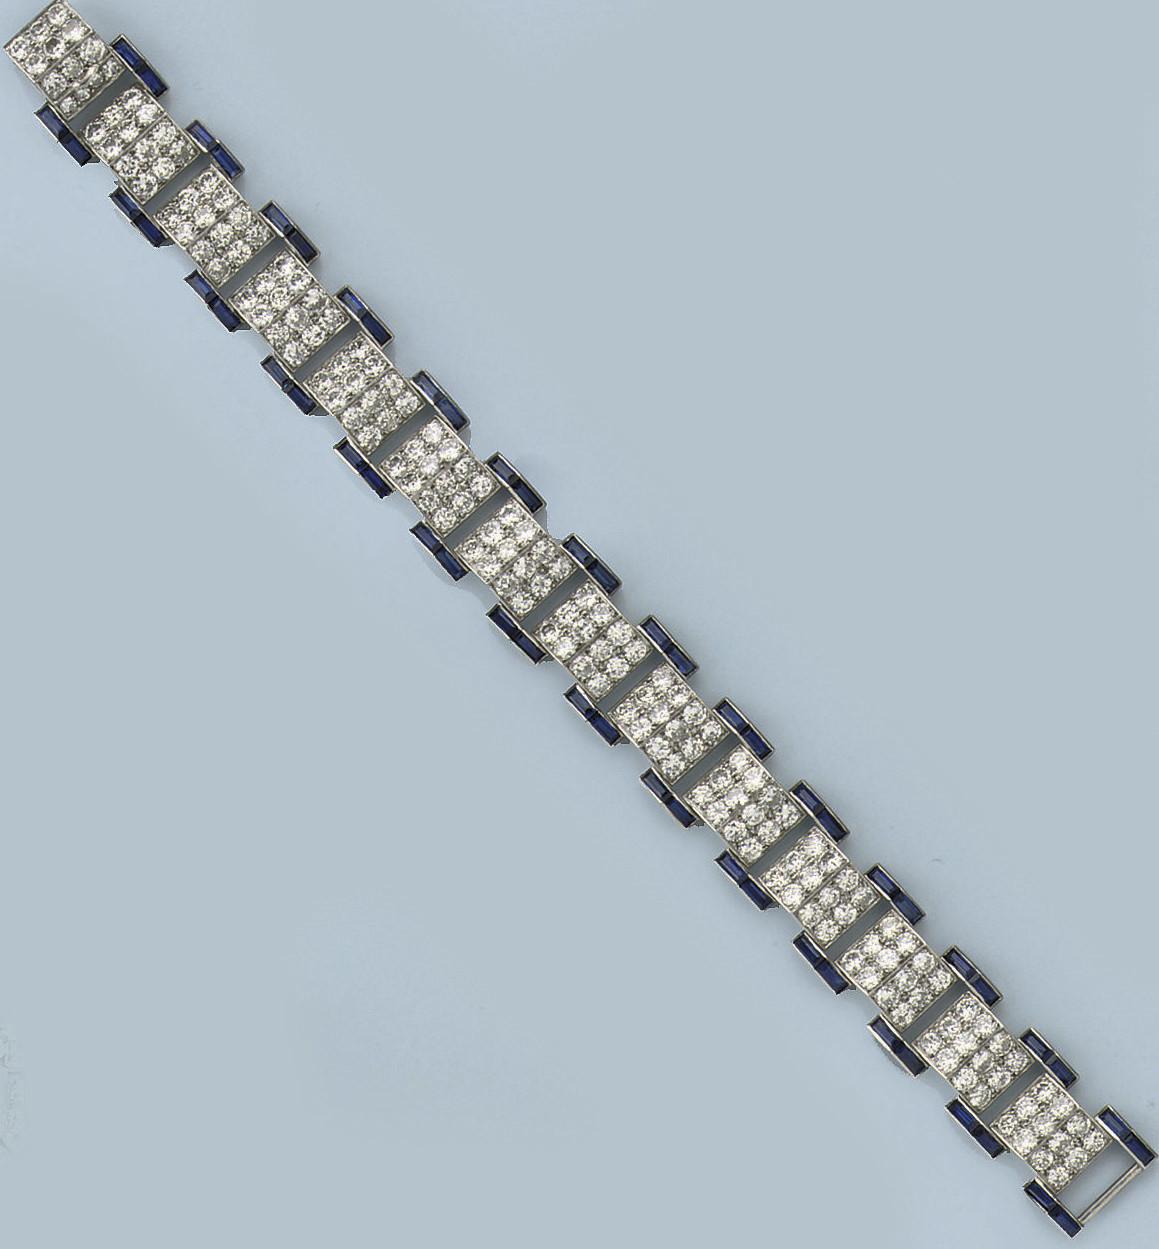 AN ART DECO SAPPHIRE AND DIAMOND BRACELET, BY CARTIER